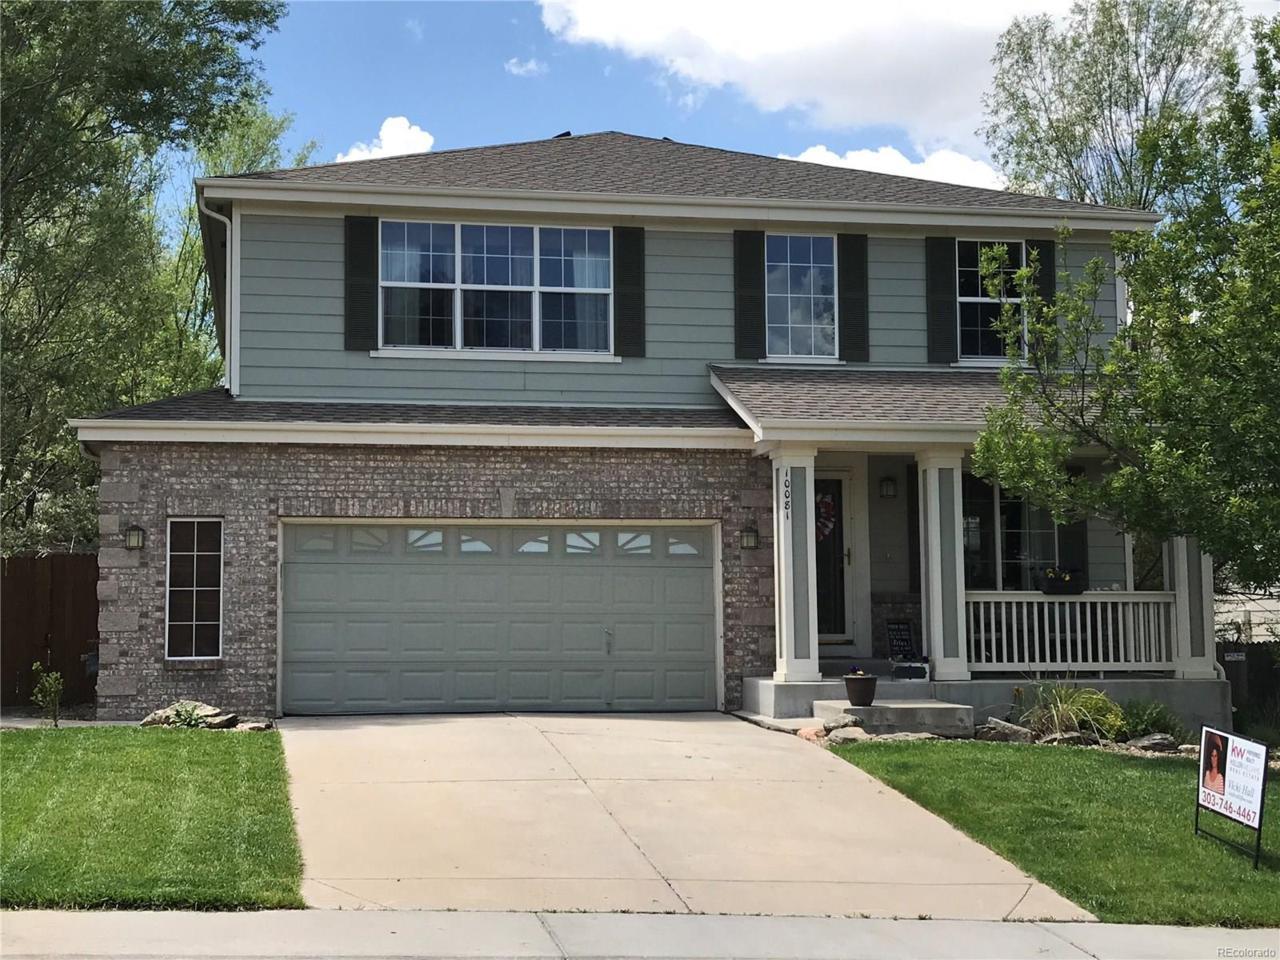 10081 Williams Street, Thornton, CO 80229 (MLS #9194659) :: 8z Real Estate